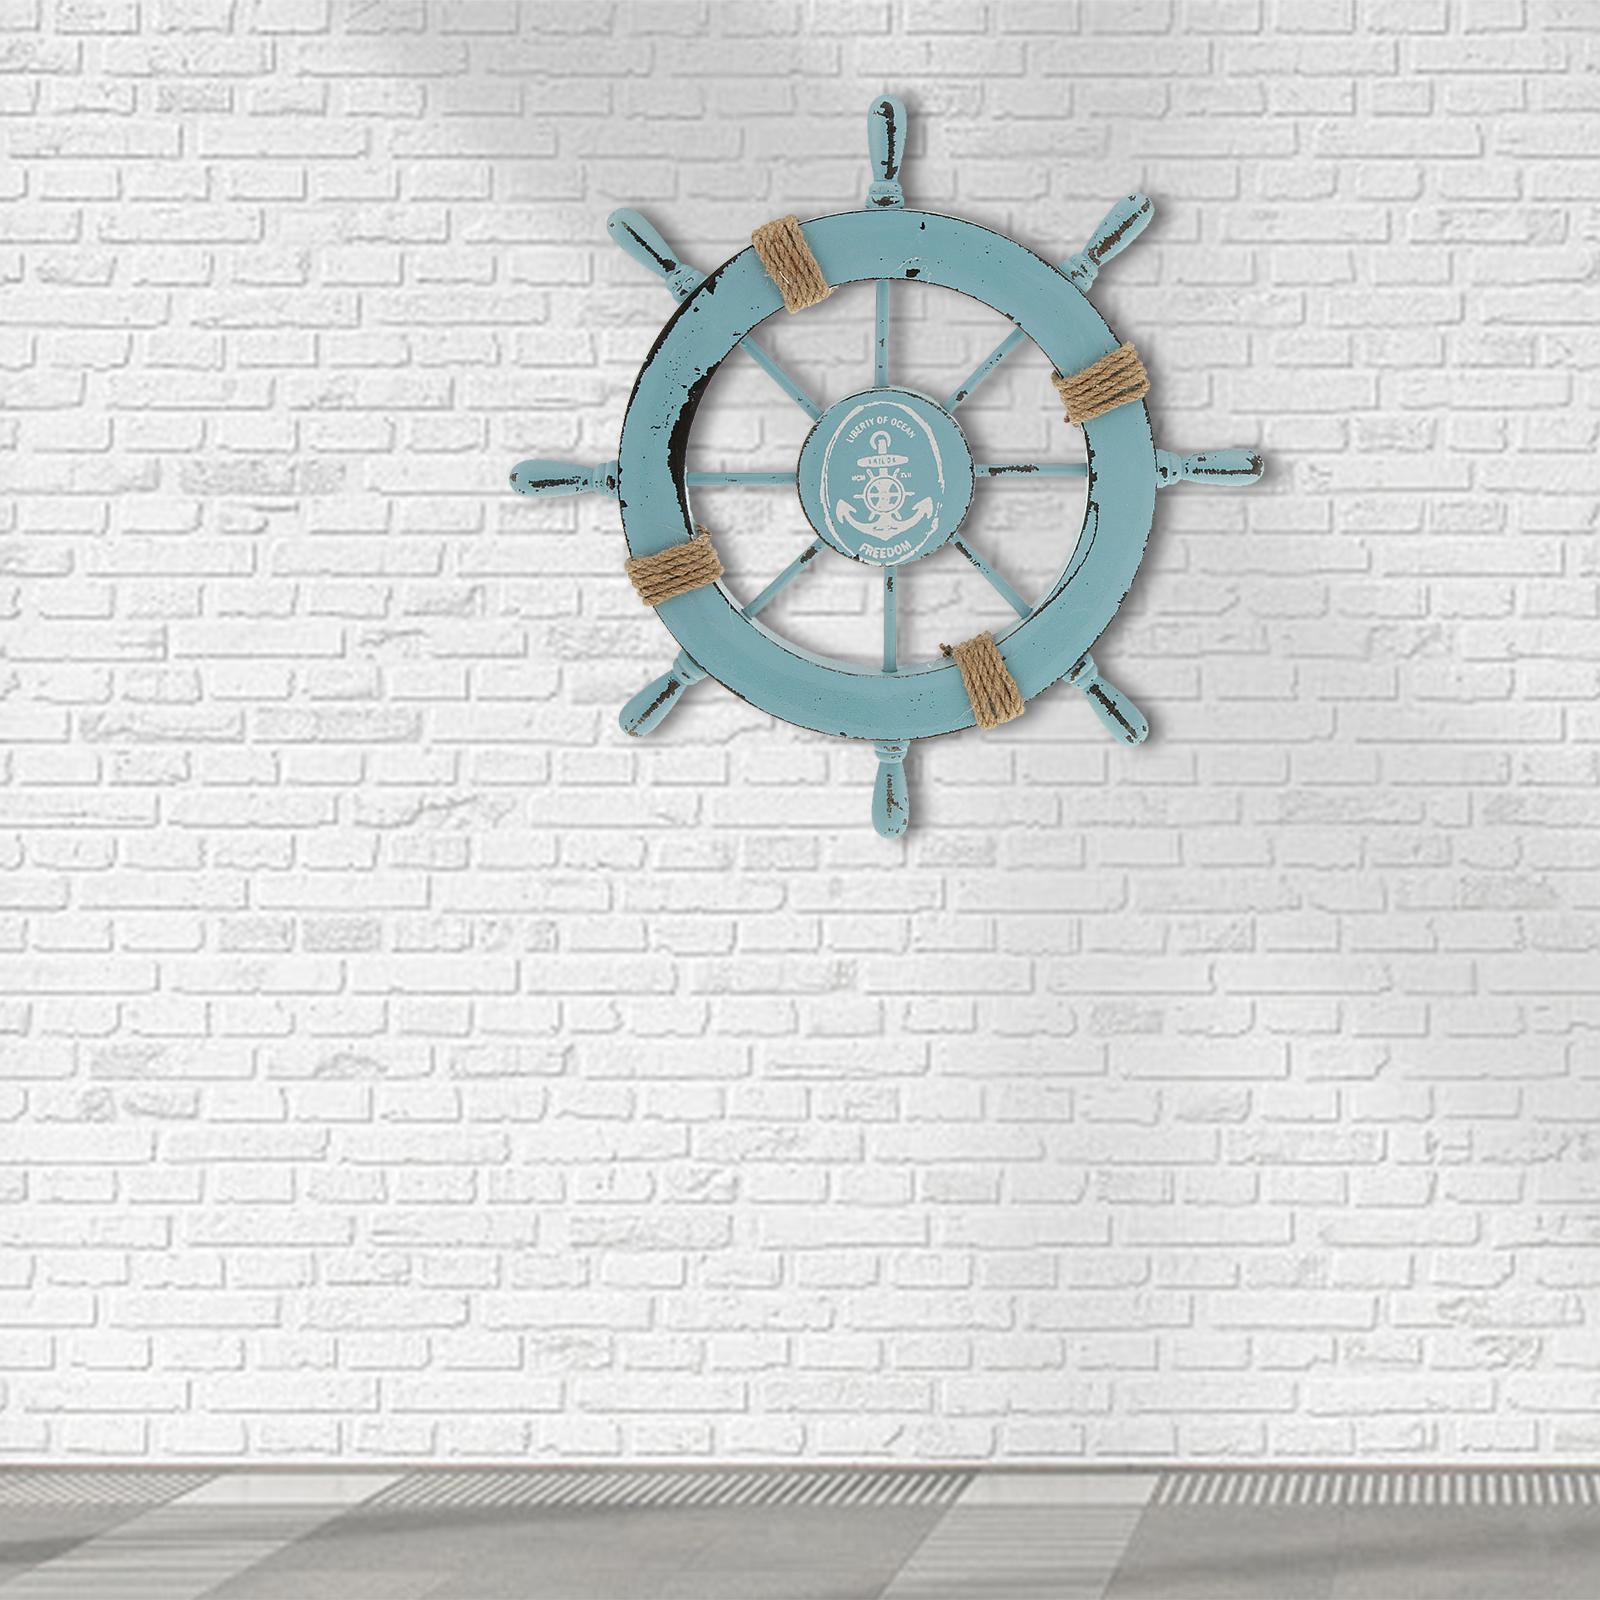 Nautical-Beach-Wooden-Boat-Ship-Wheel-Home-Bar-Wall-Party-Hanging-Decoration thumbnail 9